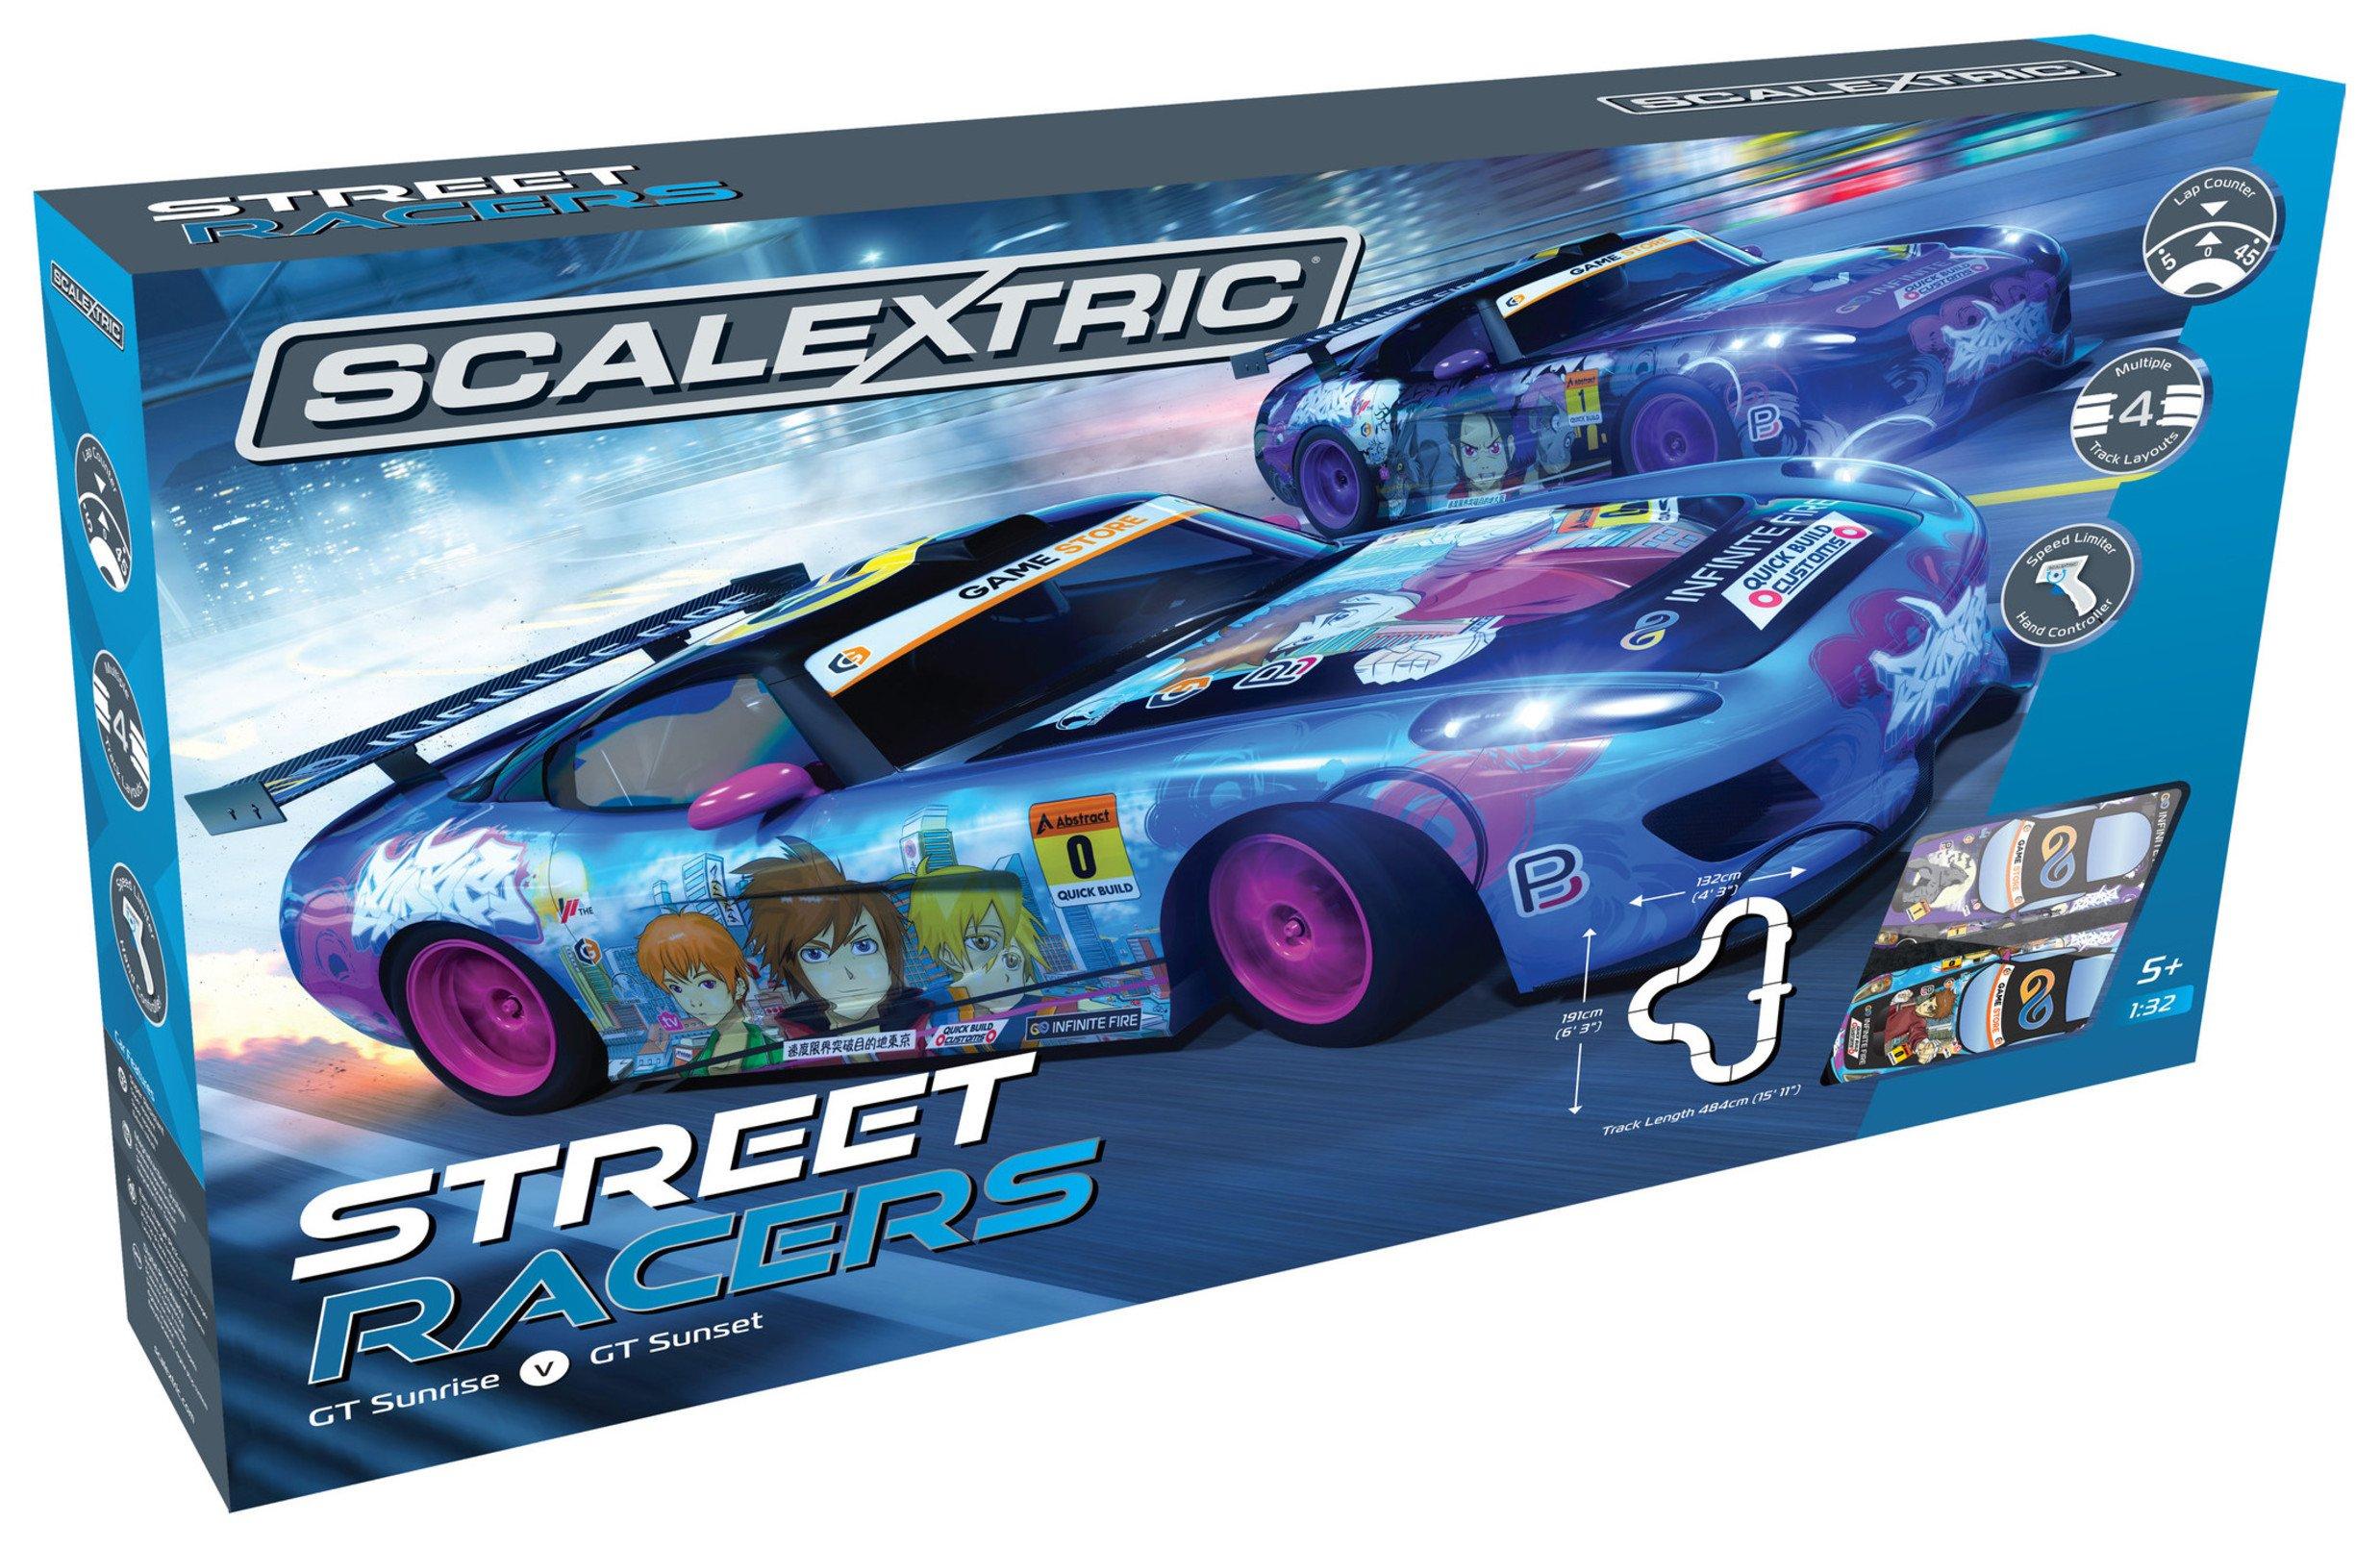 Scalextric Street Racers